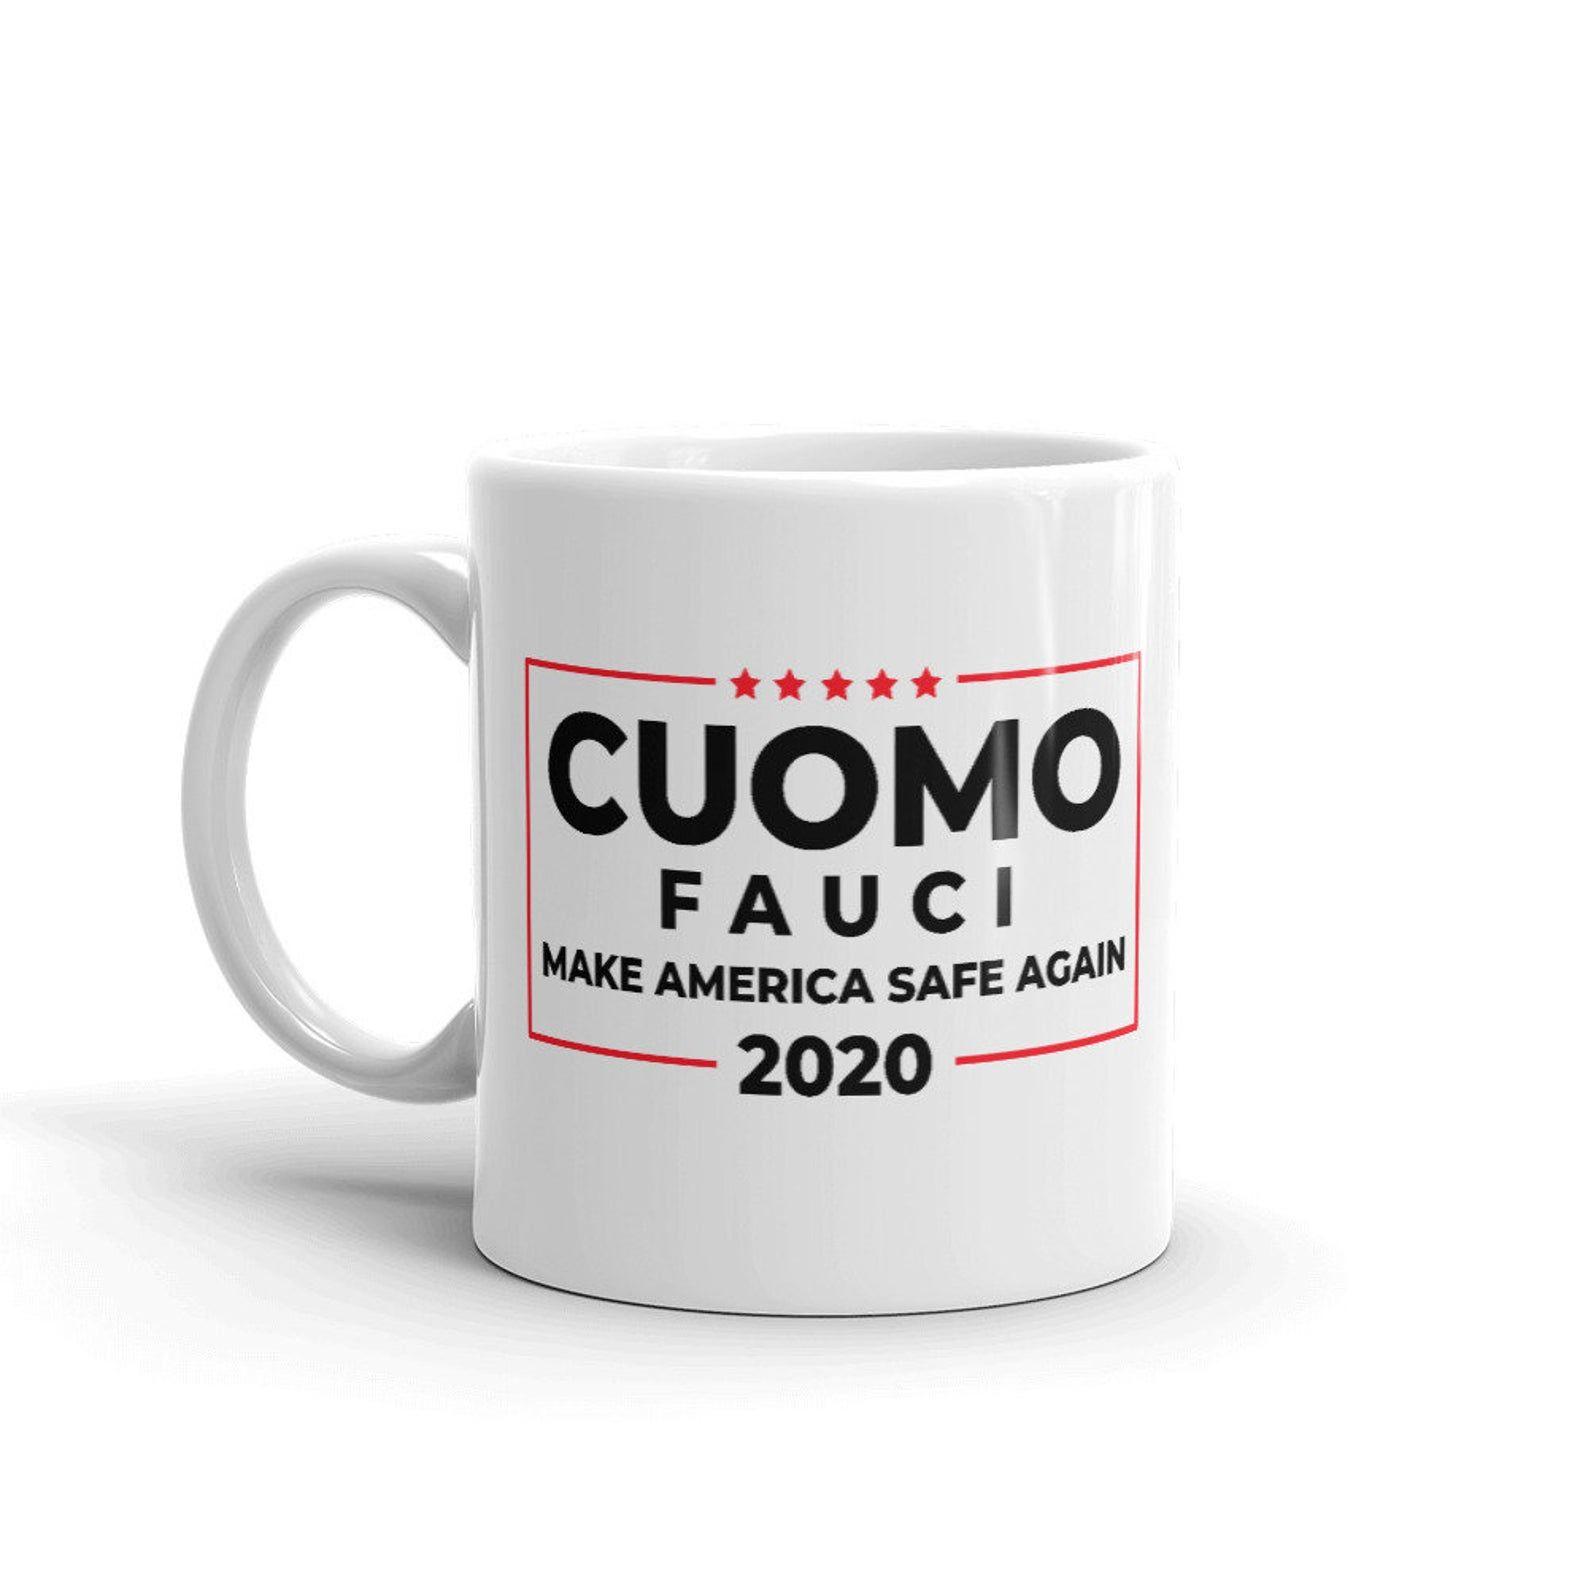 Cuomo Mug Governor Andrew Cuomo Anthony Fauci Gov Cuomo Etsy In 2020 Funny Coffee Mugs Mugs Cute Coffee Mugs